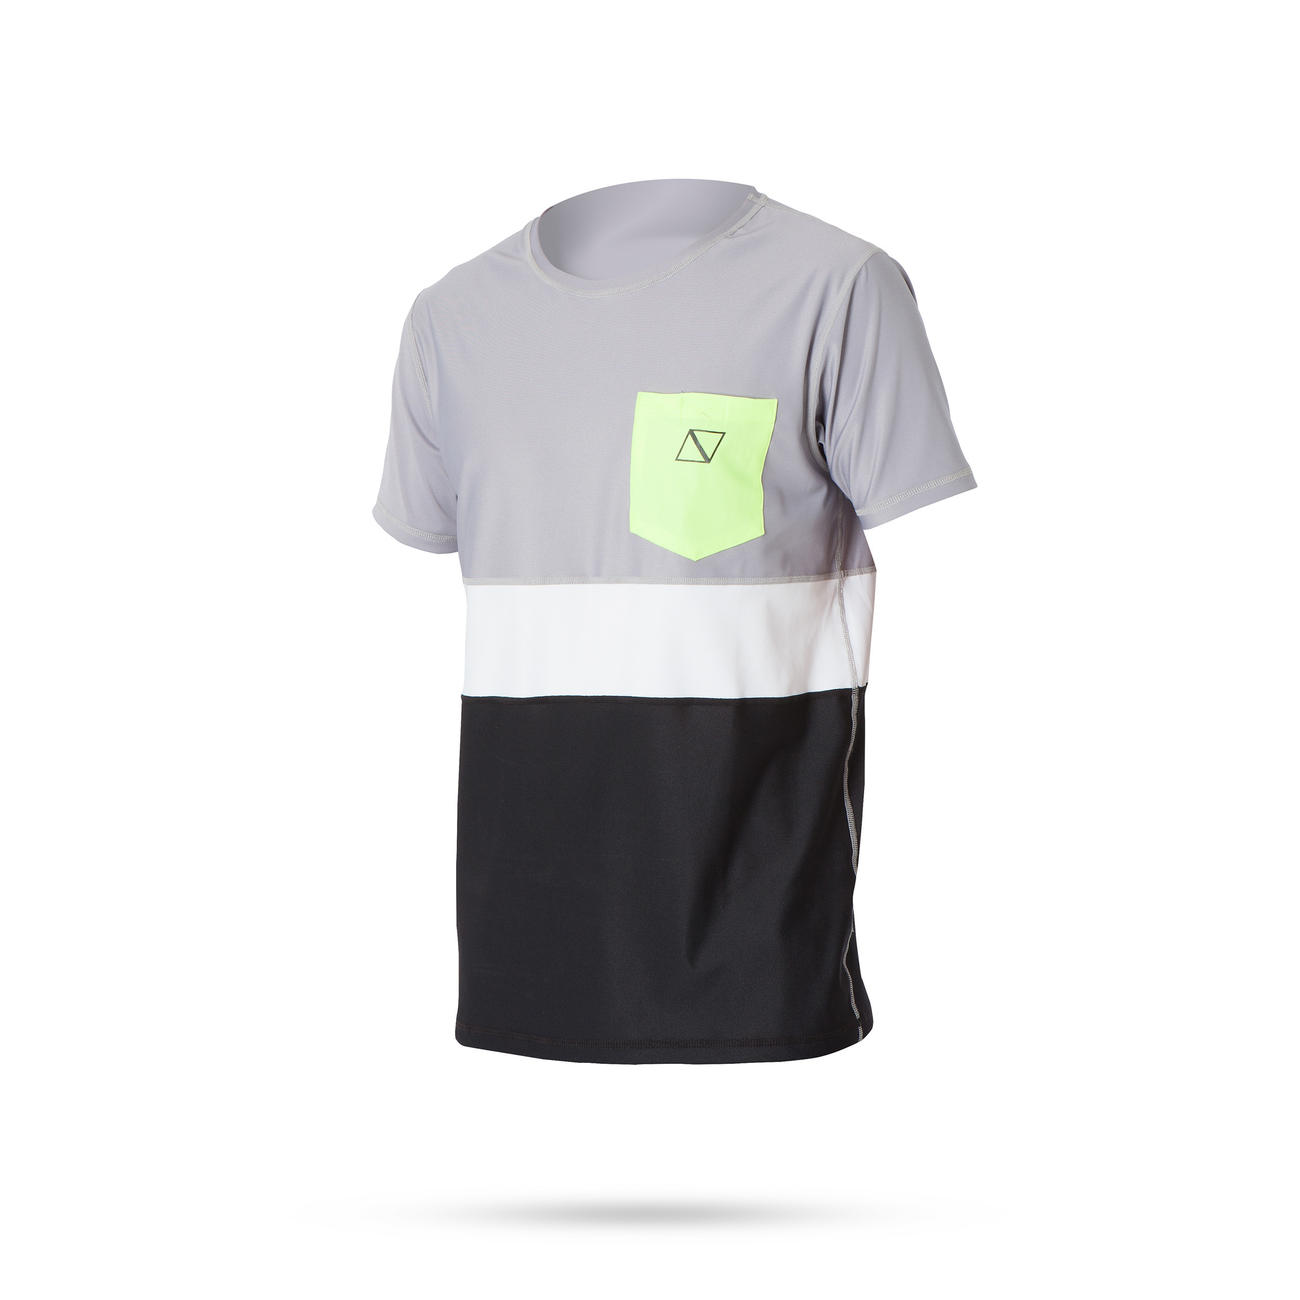 CUBE QUICKDRY S/S Unisex 3色ボーダー 半袖吸汗速乾シャツ